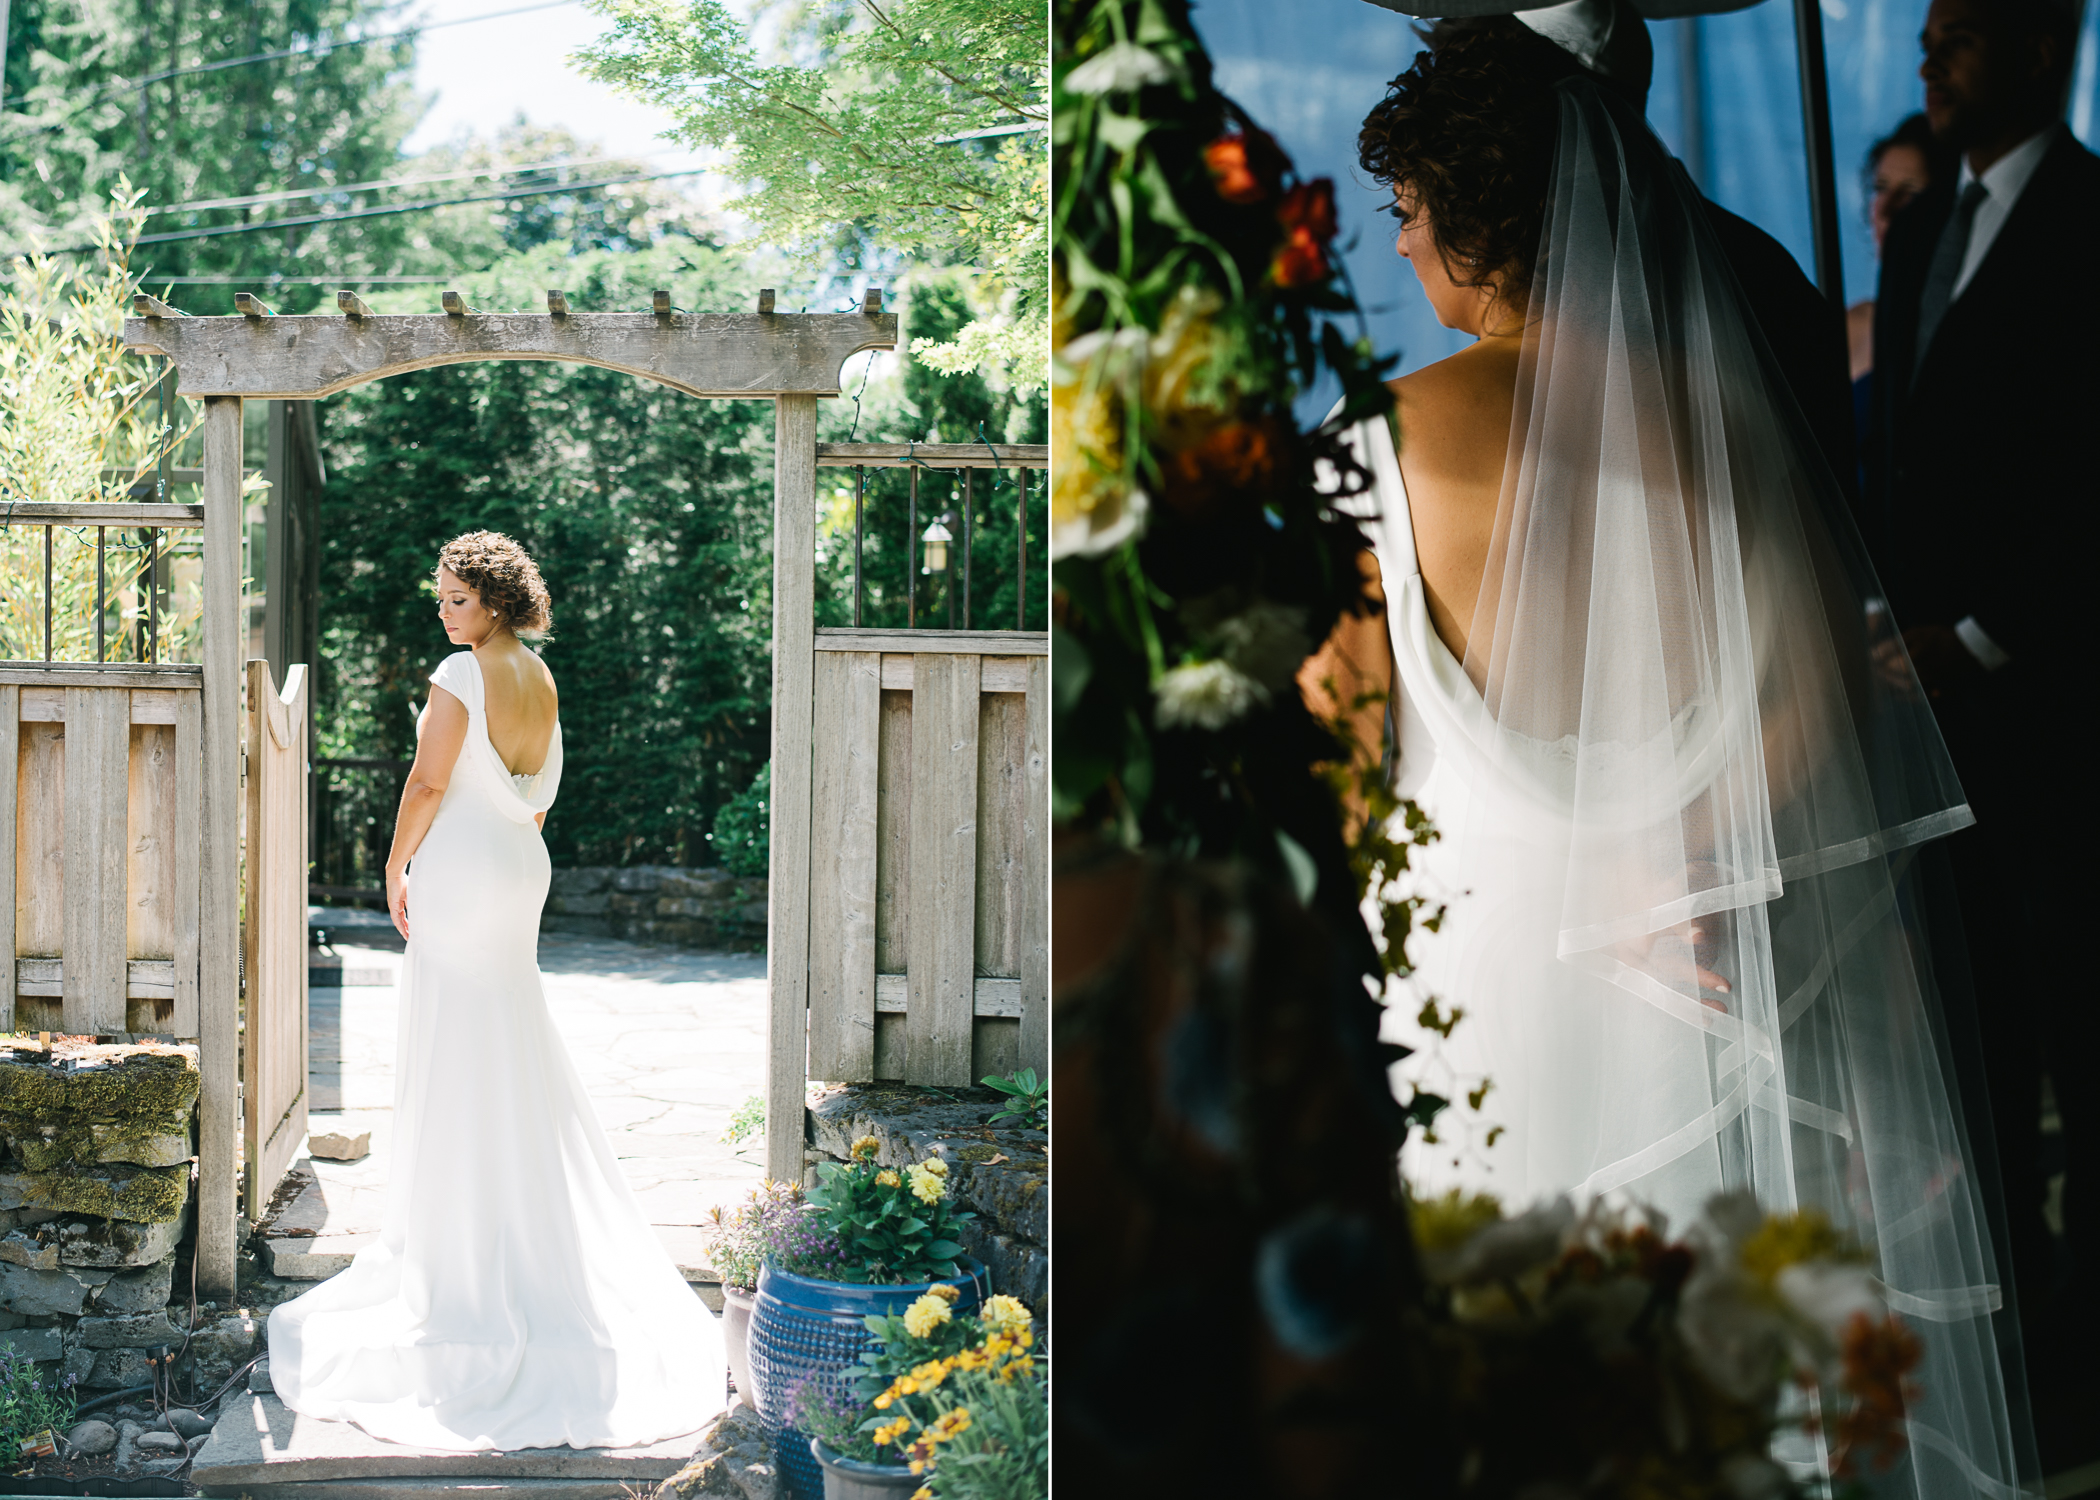 011-portland-wedding-photography-best-2018.jpg